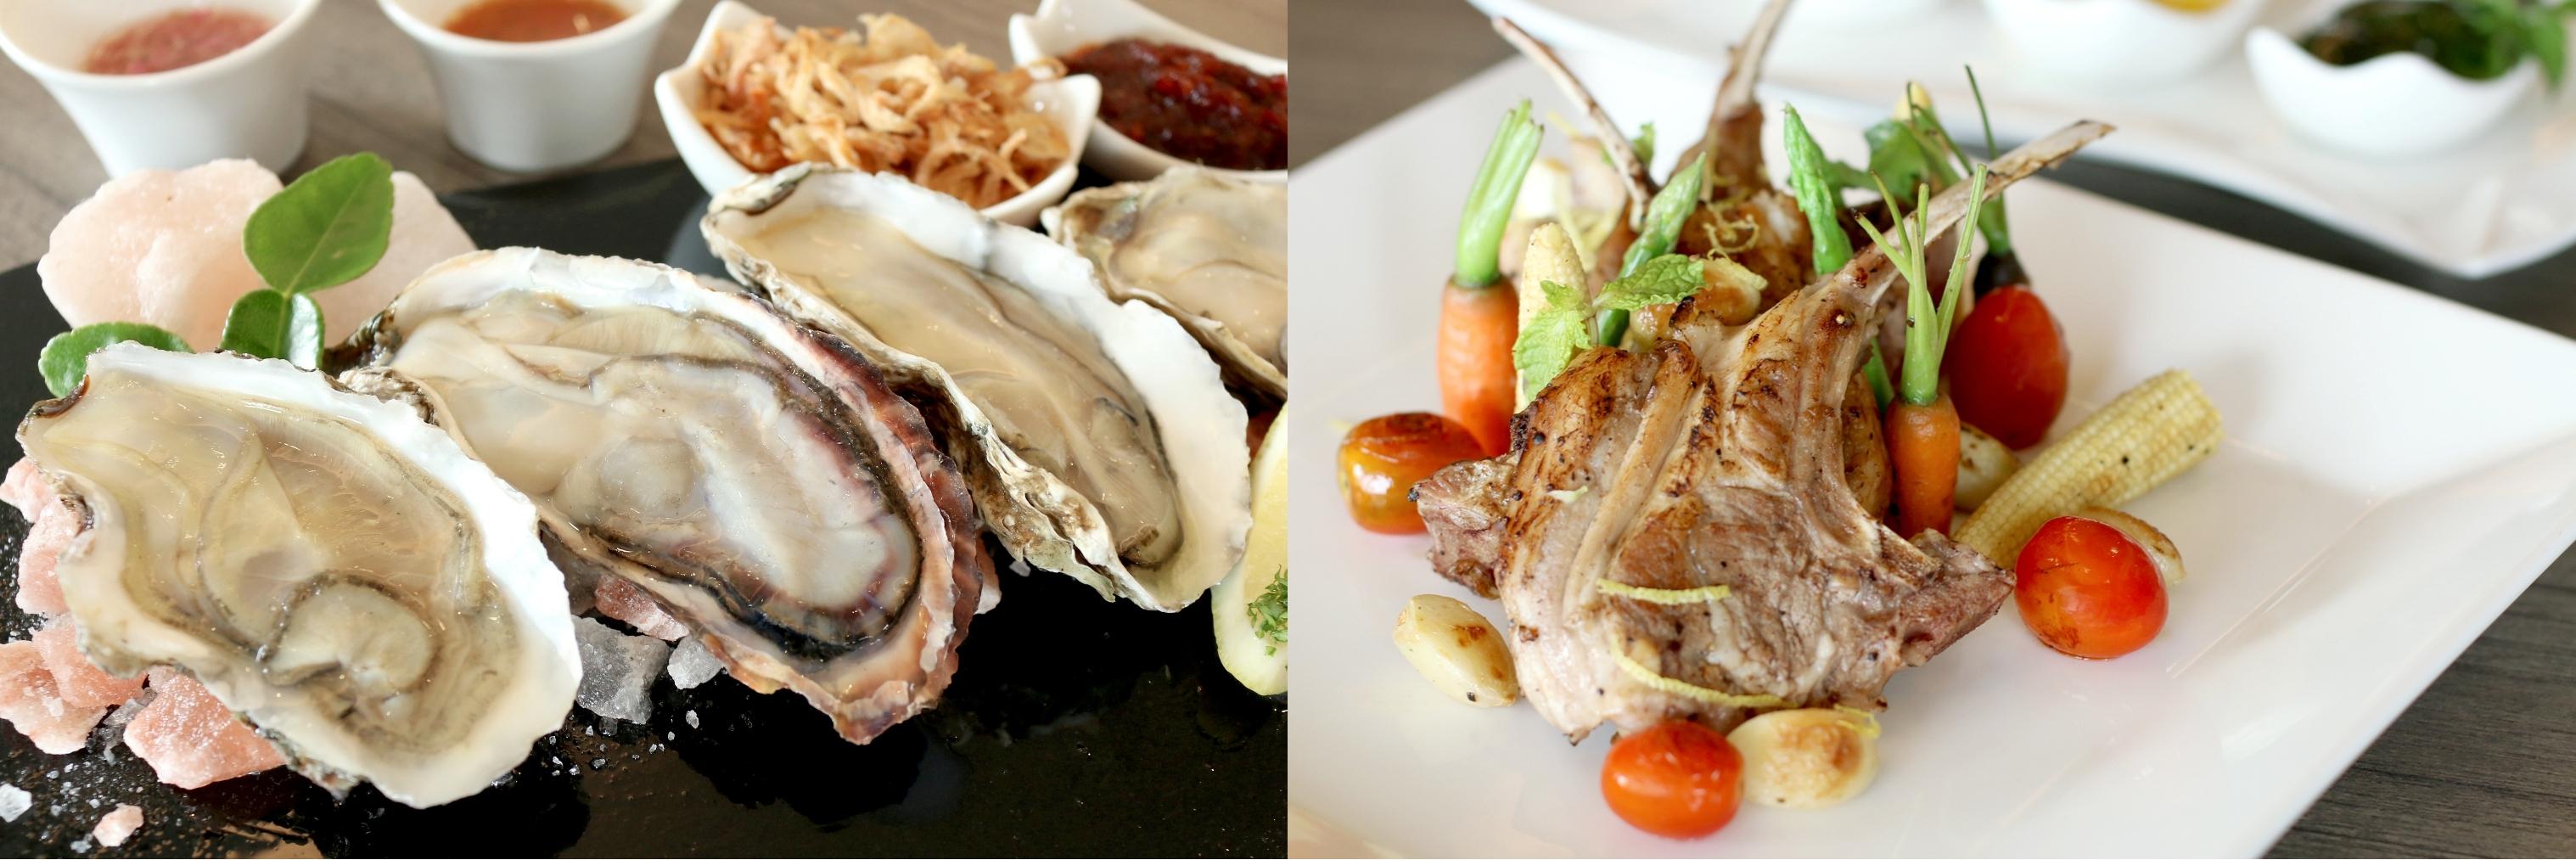 Seafood-international-buffet-at-the-eight- Mercure-Hotels-Bangkok-Siam